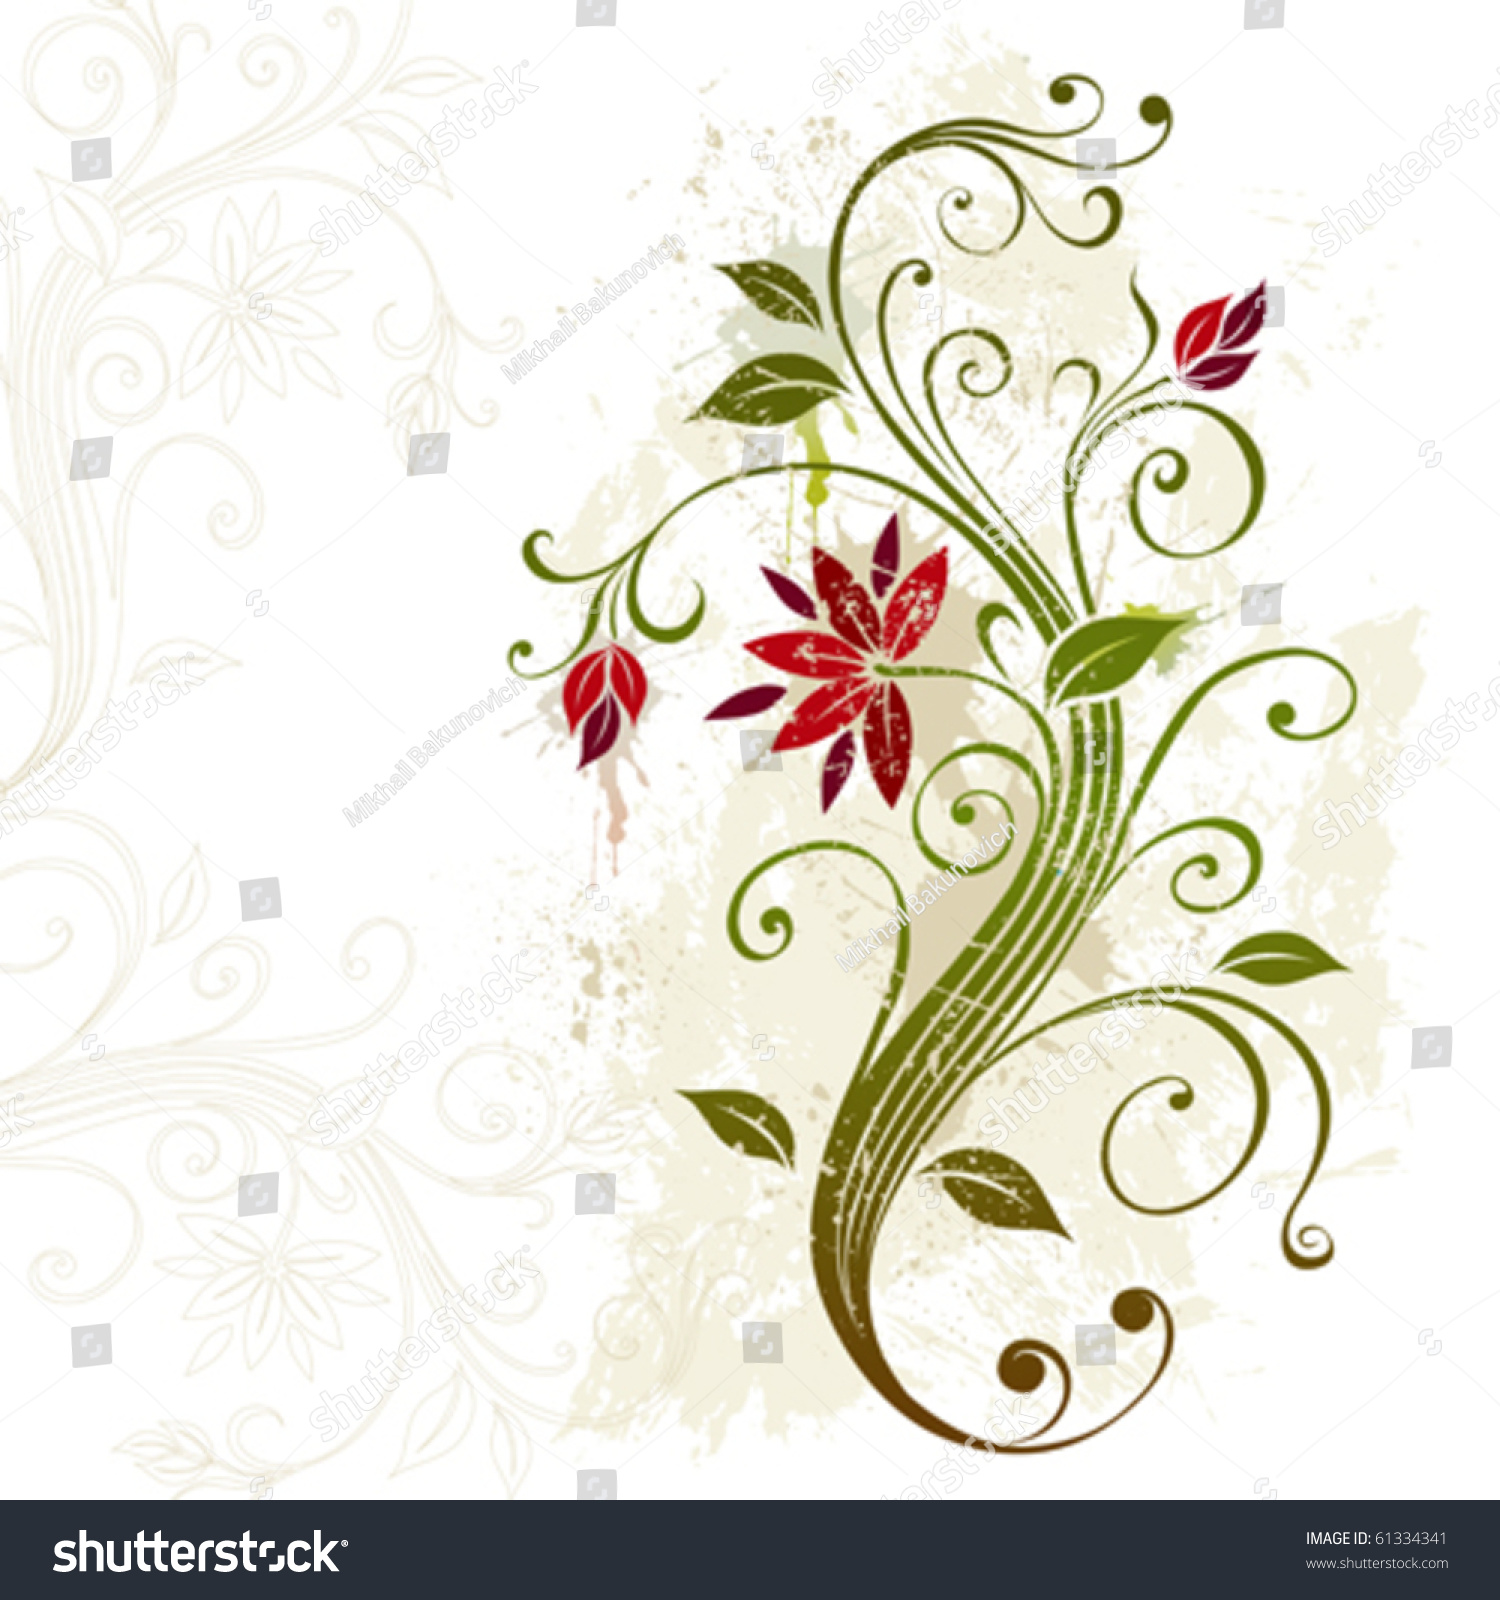 Stylized Flower On Grunge Background Stock Vector 61334341 ...